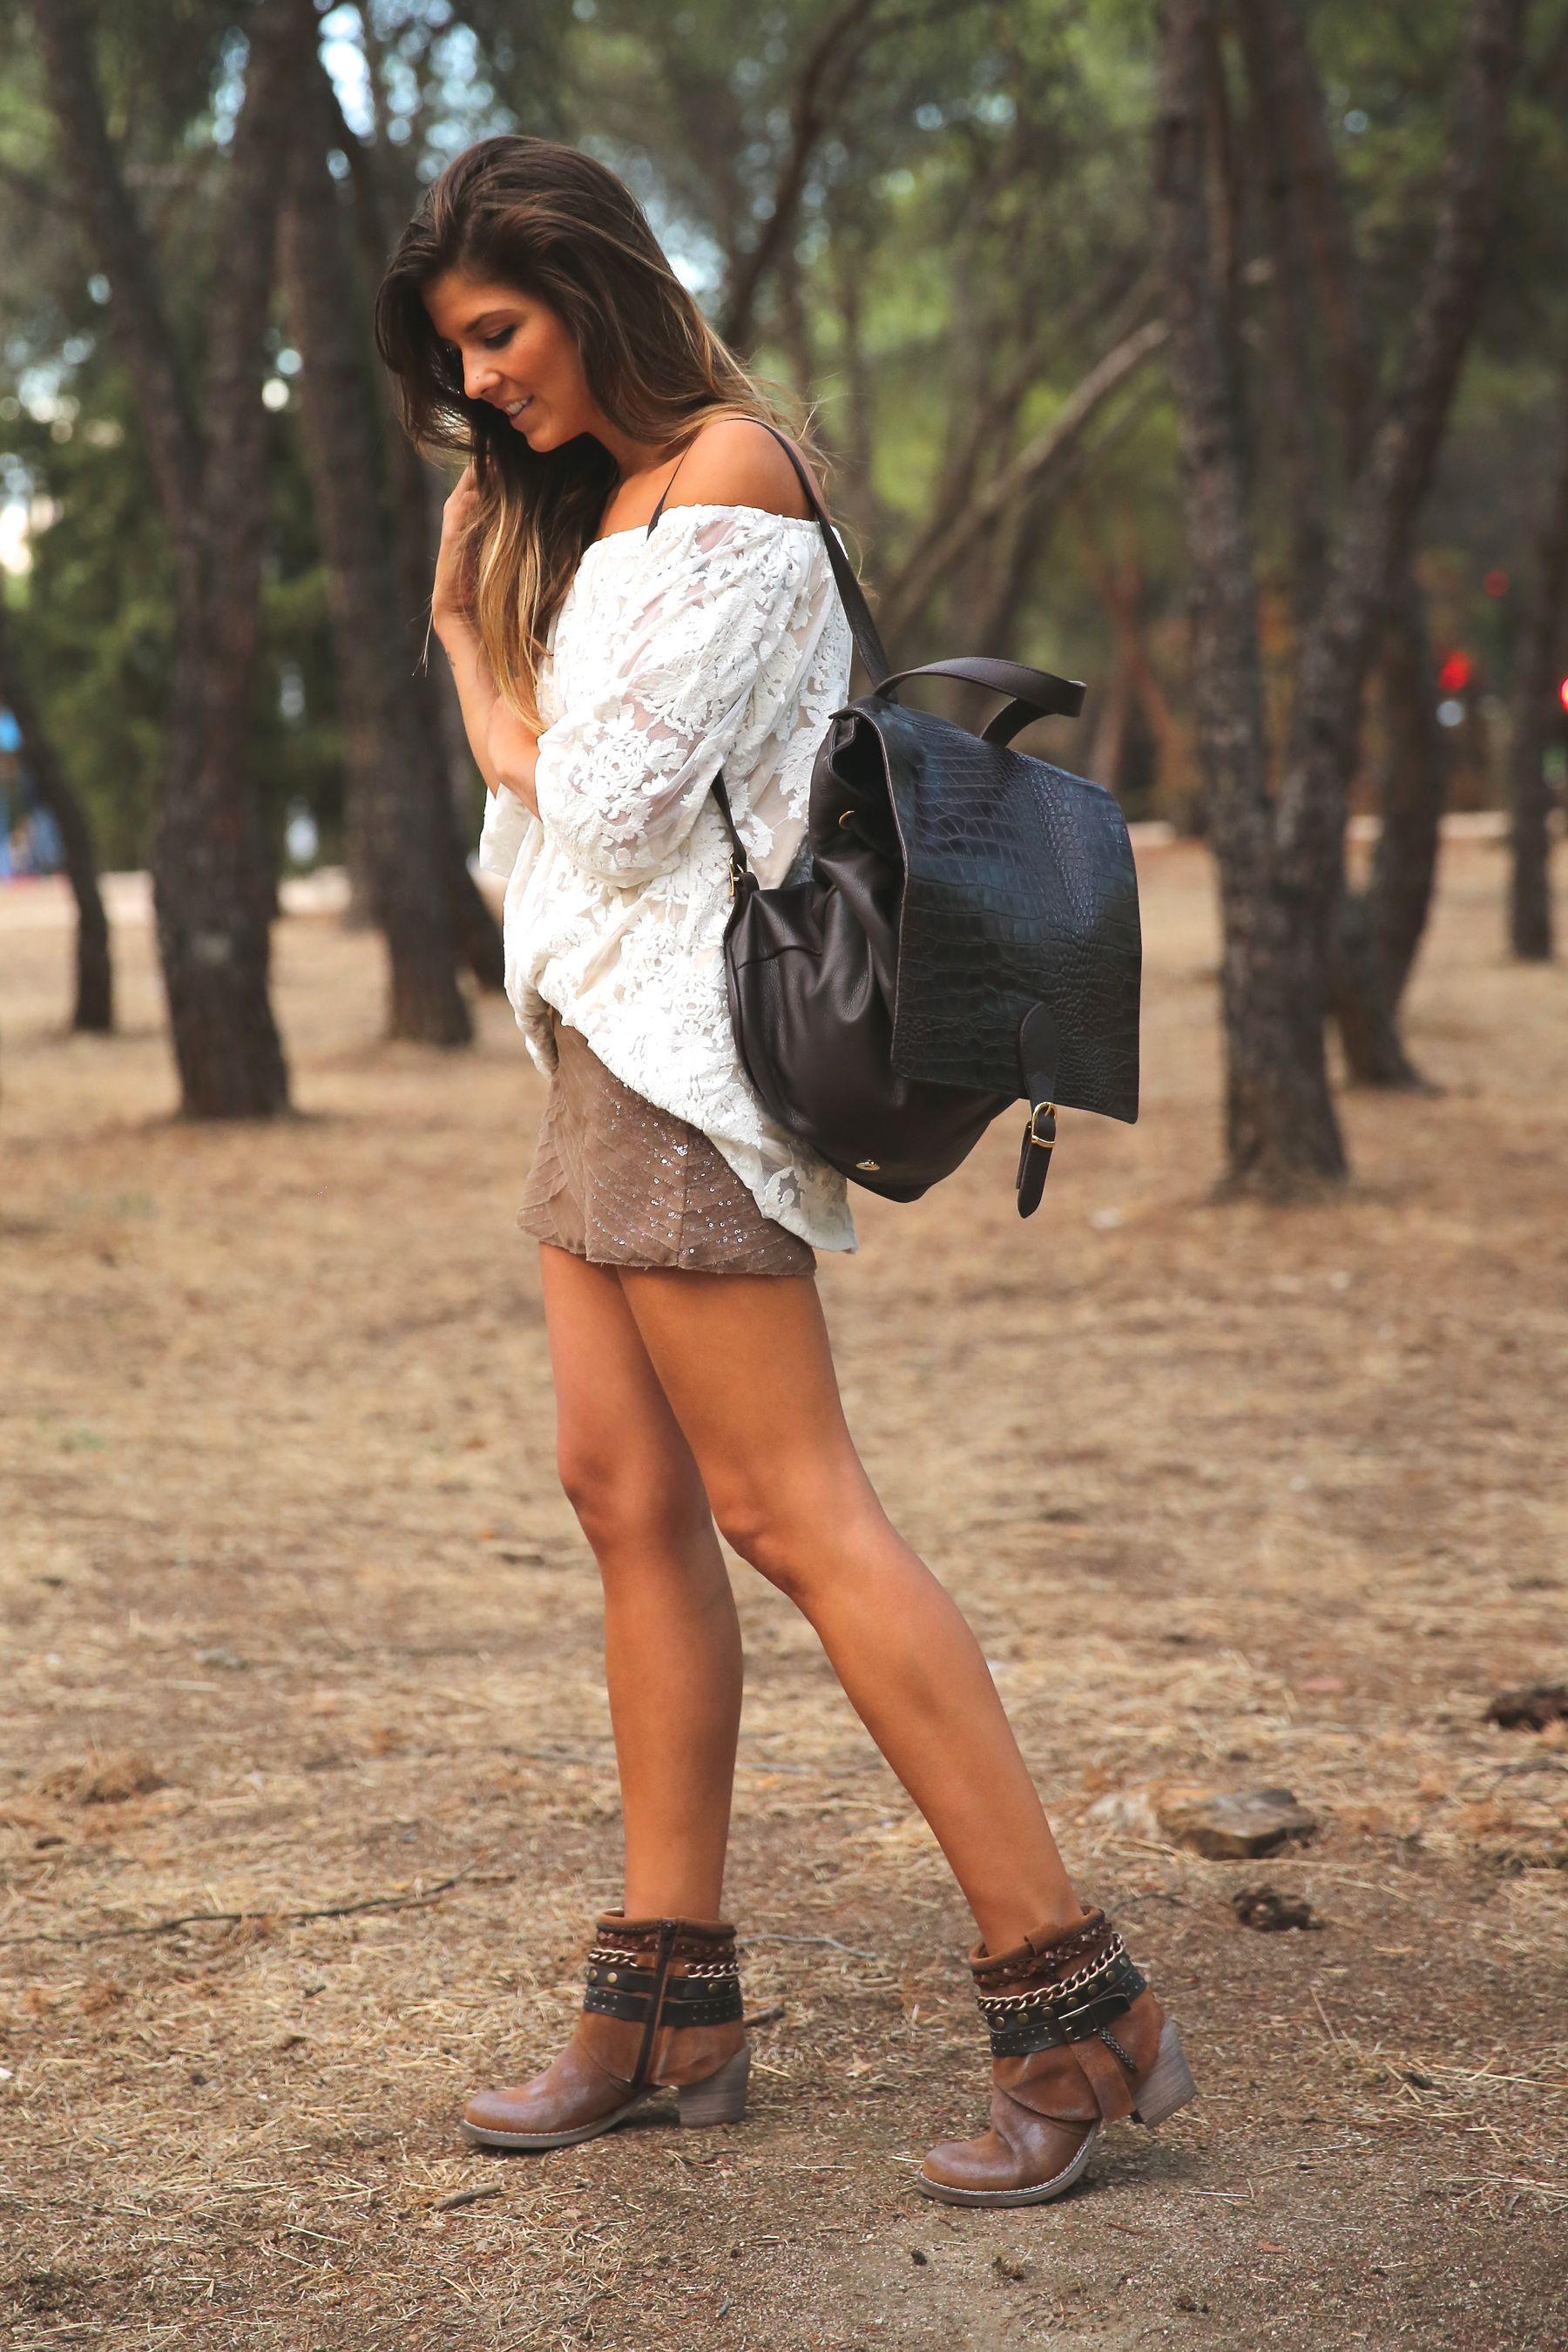 trendy_taste-look-outfit-street_style-ootd-blog-blogger-fashion_spain-moda_españa-primavera/verano-boho-trendy-planes_de_día-lentejuelas-falda-botines-étnico-mochila-crochet-encaje-10